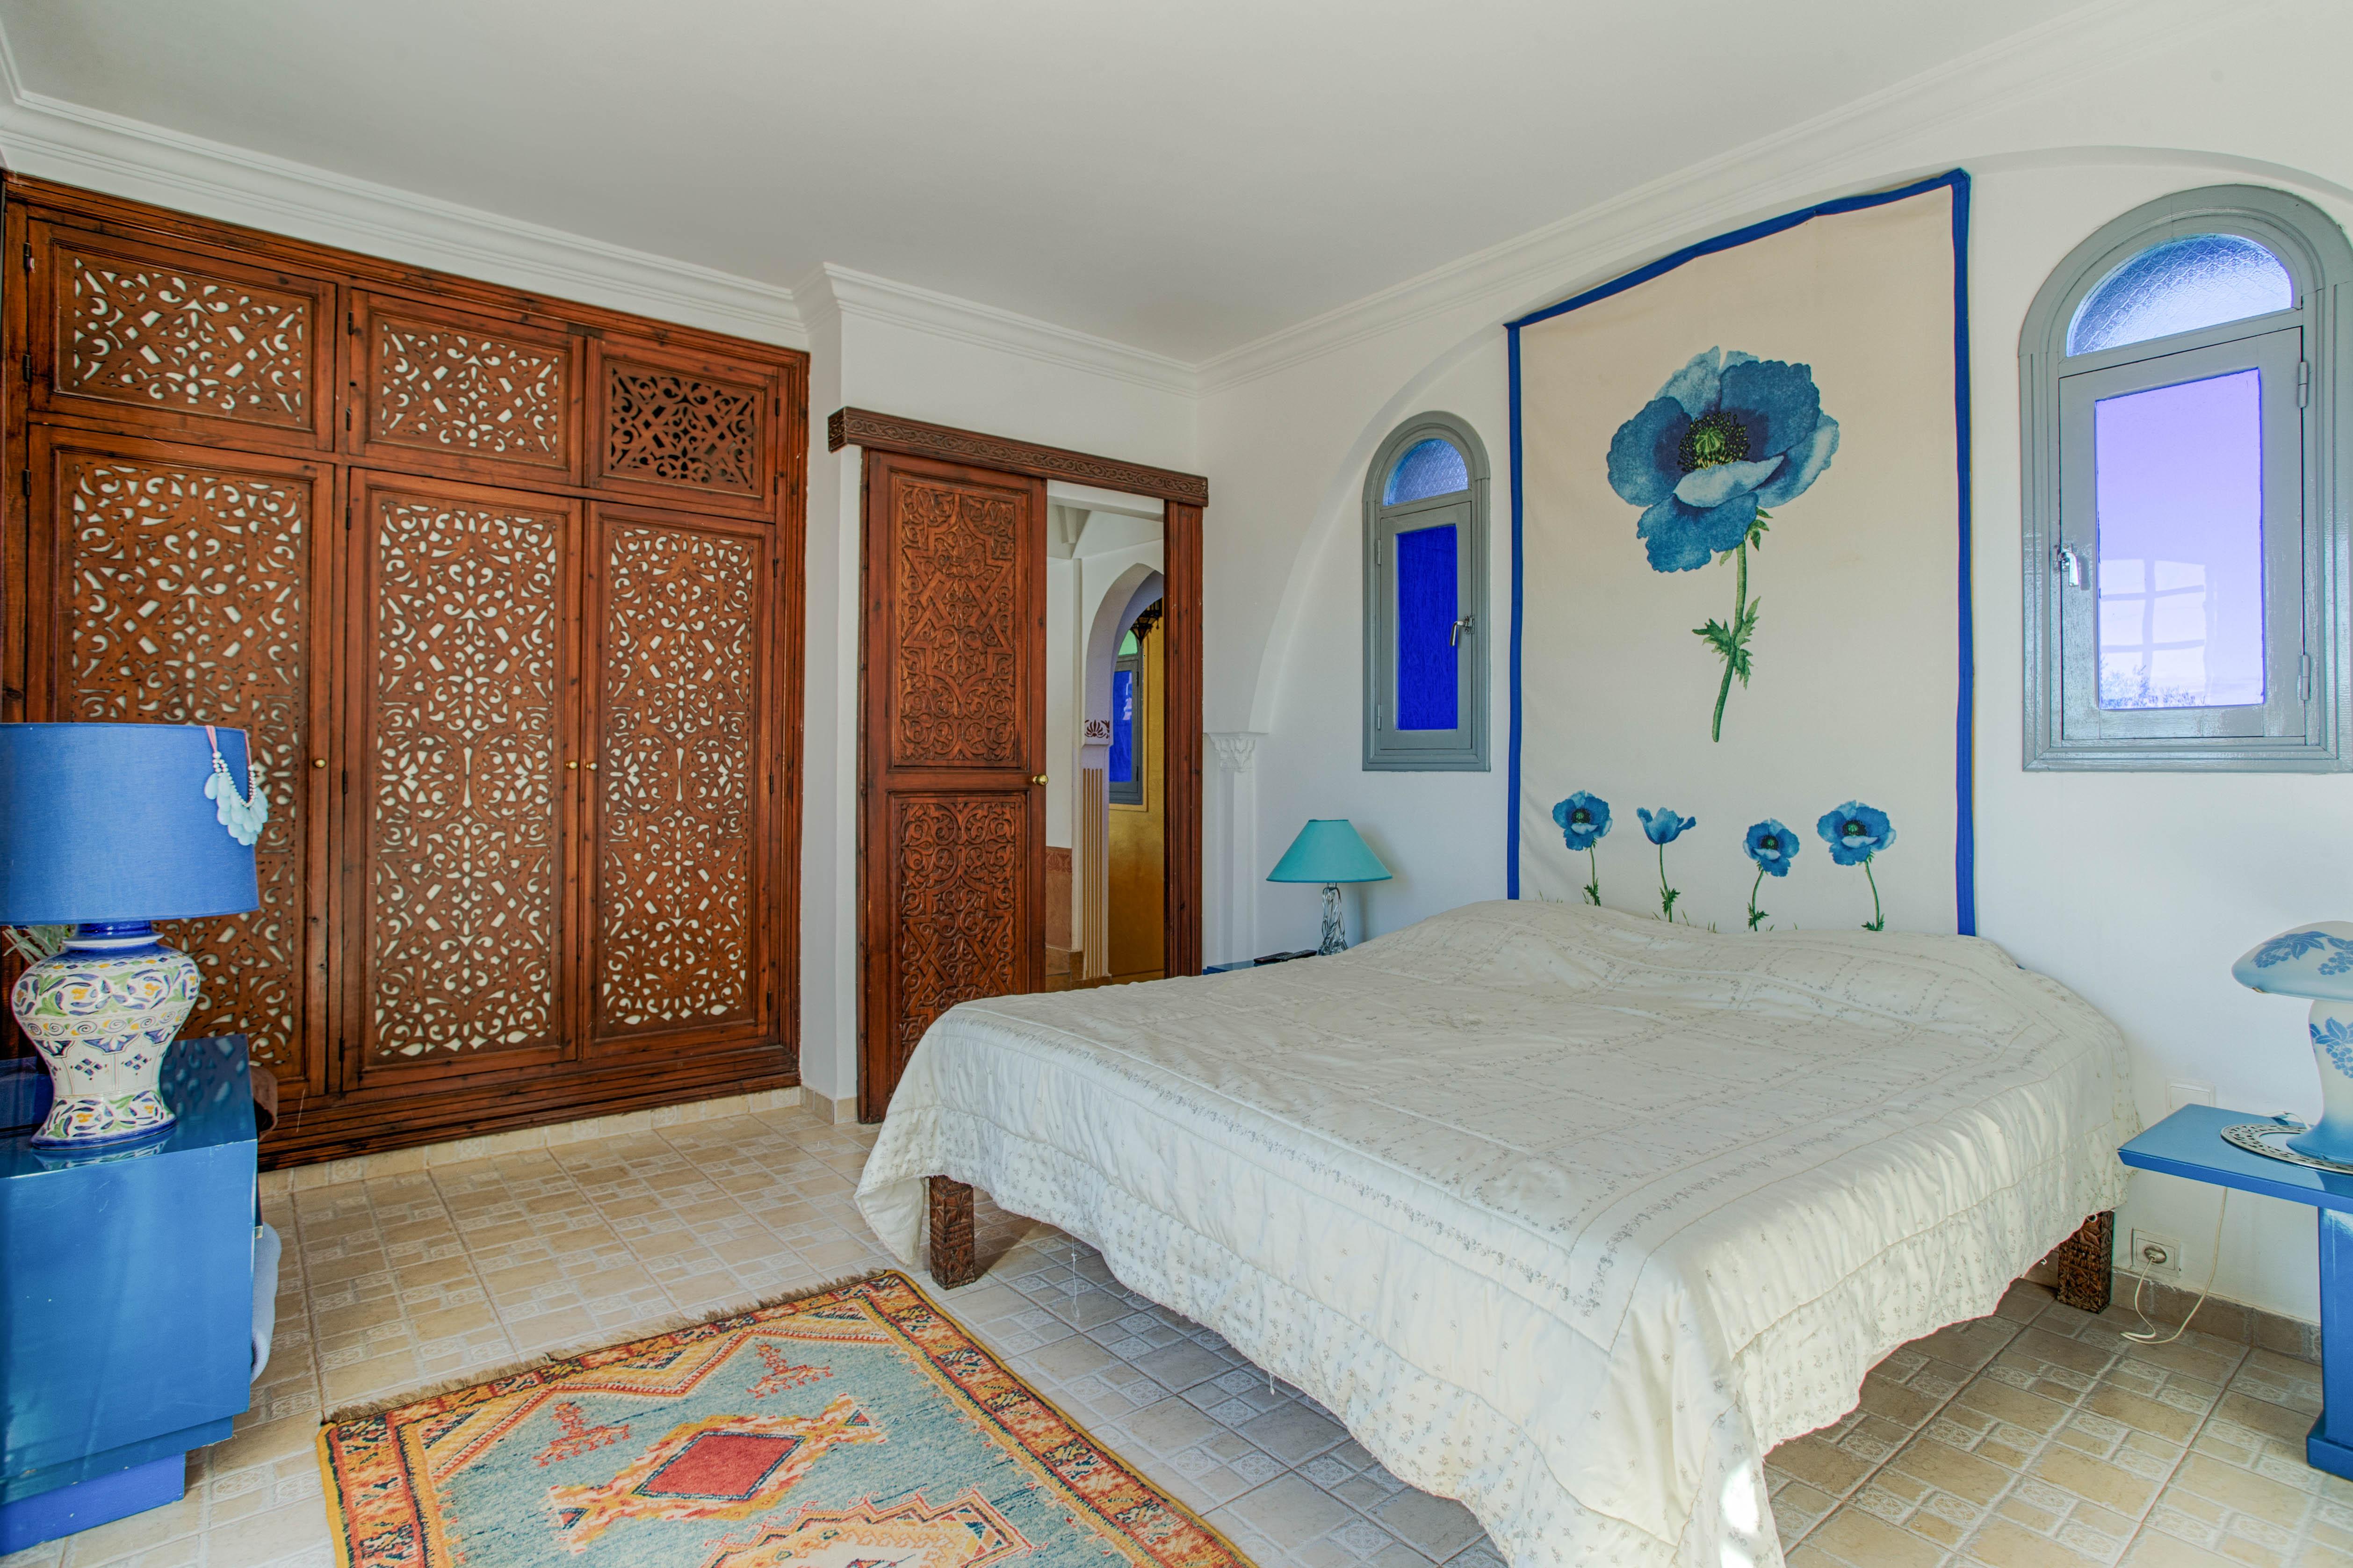 Apartment VILLA LES OLIVIERS - SPLENDIDE VILLA AVEC PISCINE A MARRAKECH photo 16792354